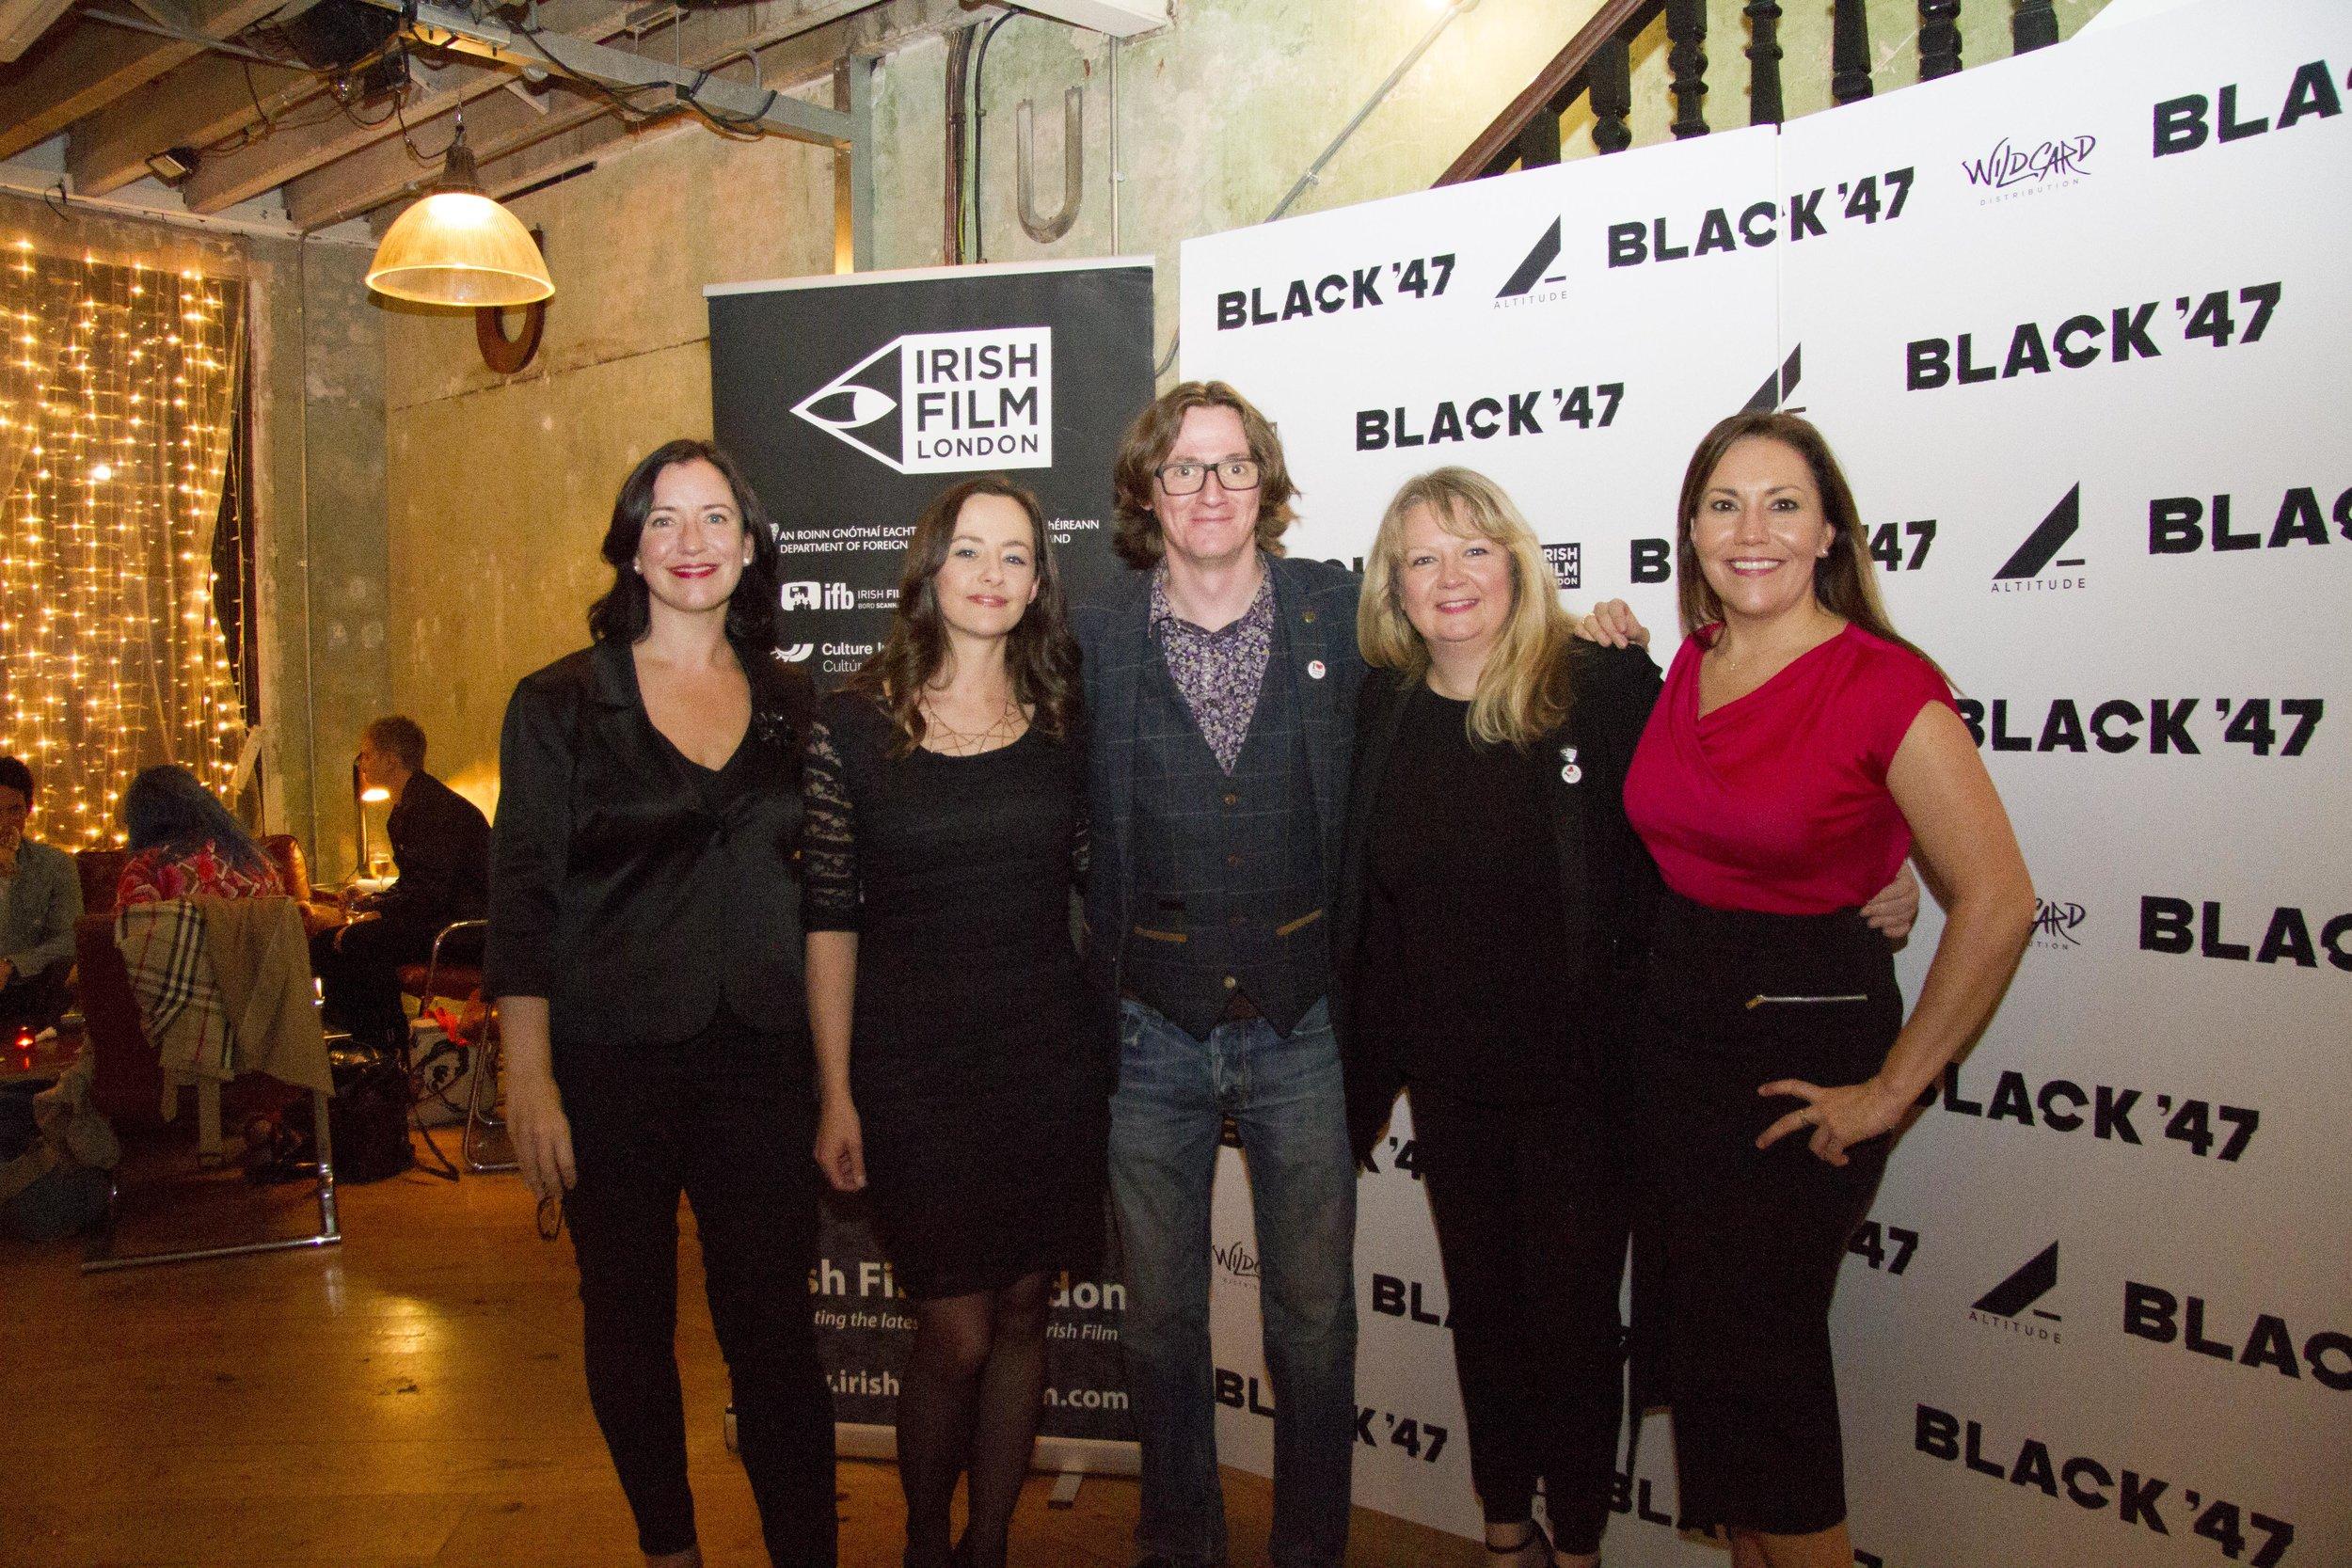 Black 47 London Premiere 2018 Photos courtesy of Noel Mullen Irish Film London 75 Angela Sammon Kelly O'Connor Ed Byrne Sinead Smith and Claire Turvey.jpg